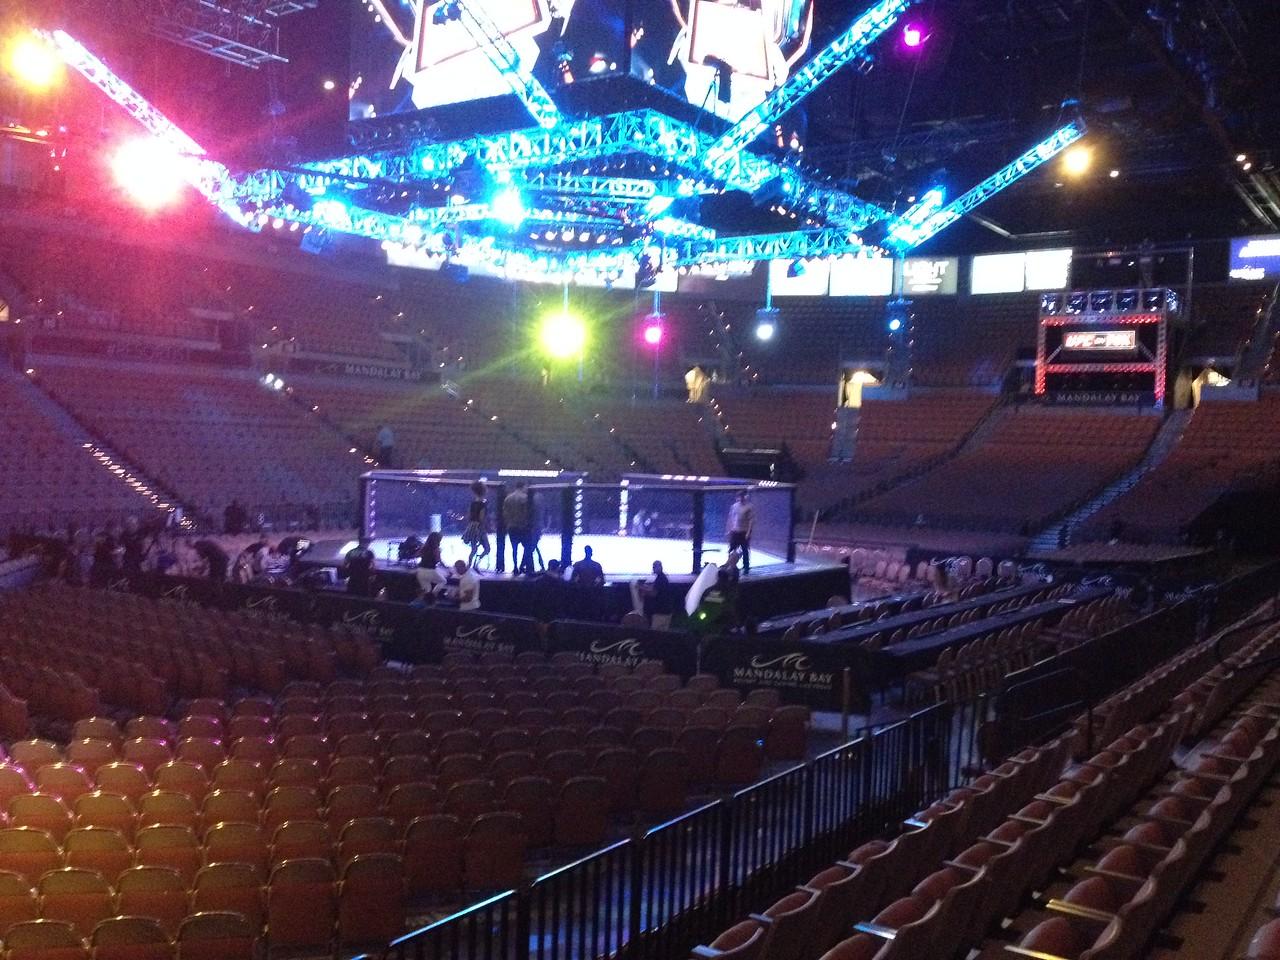 UFC San Antonio - calm before the storm - photo by. S., Tecci